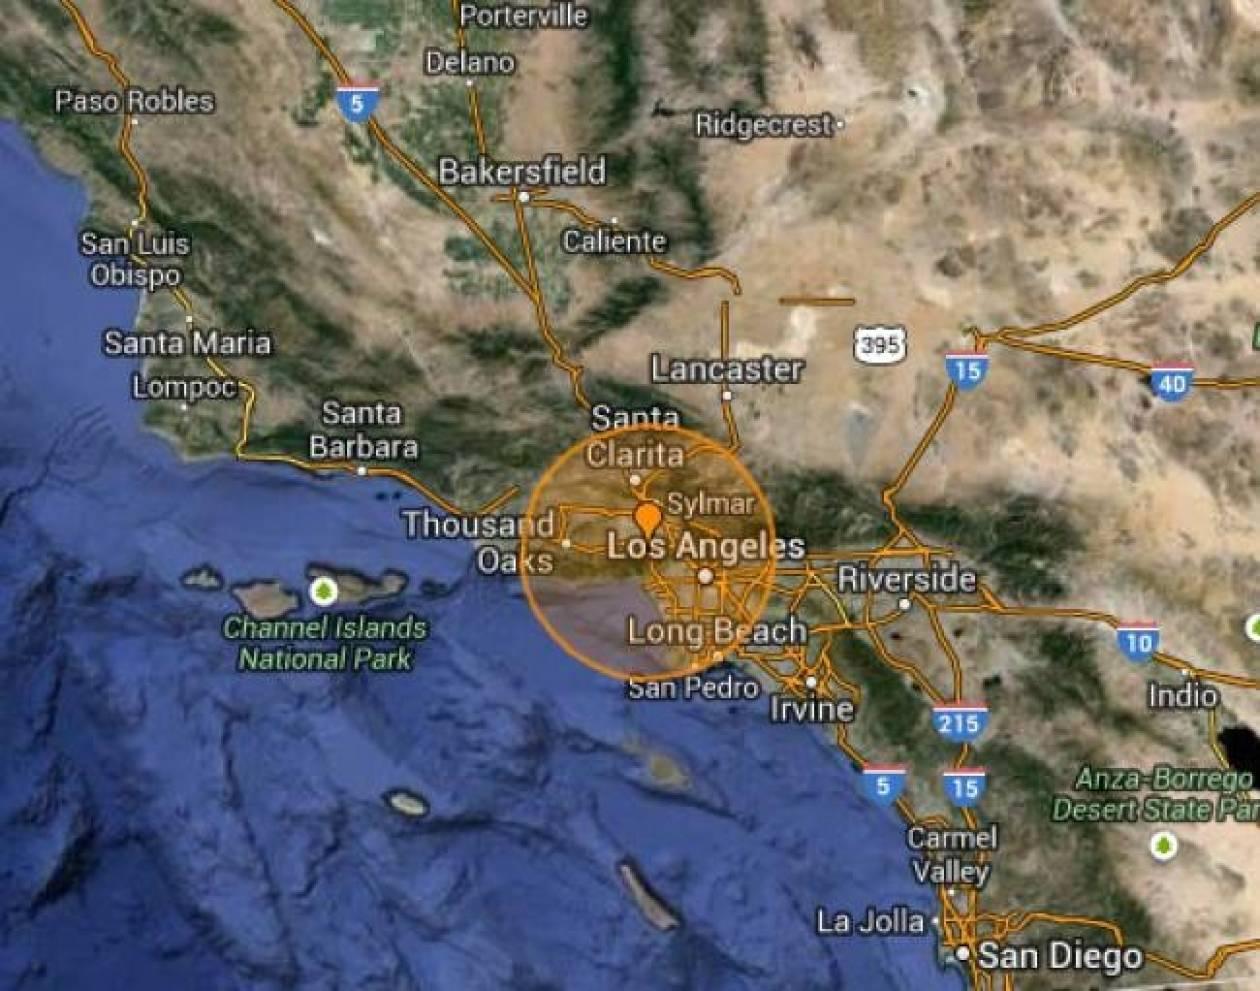 Earthquake 4.7 Richter strikes Los Angeles